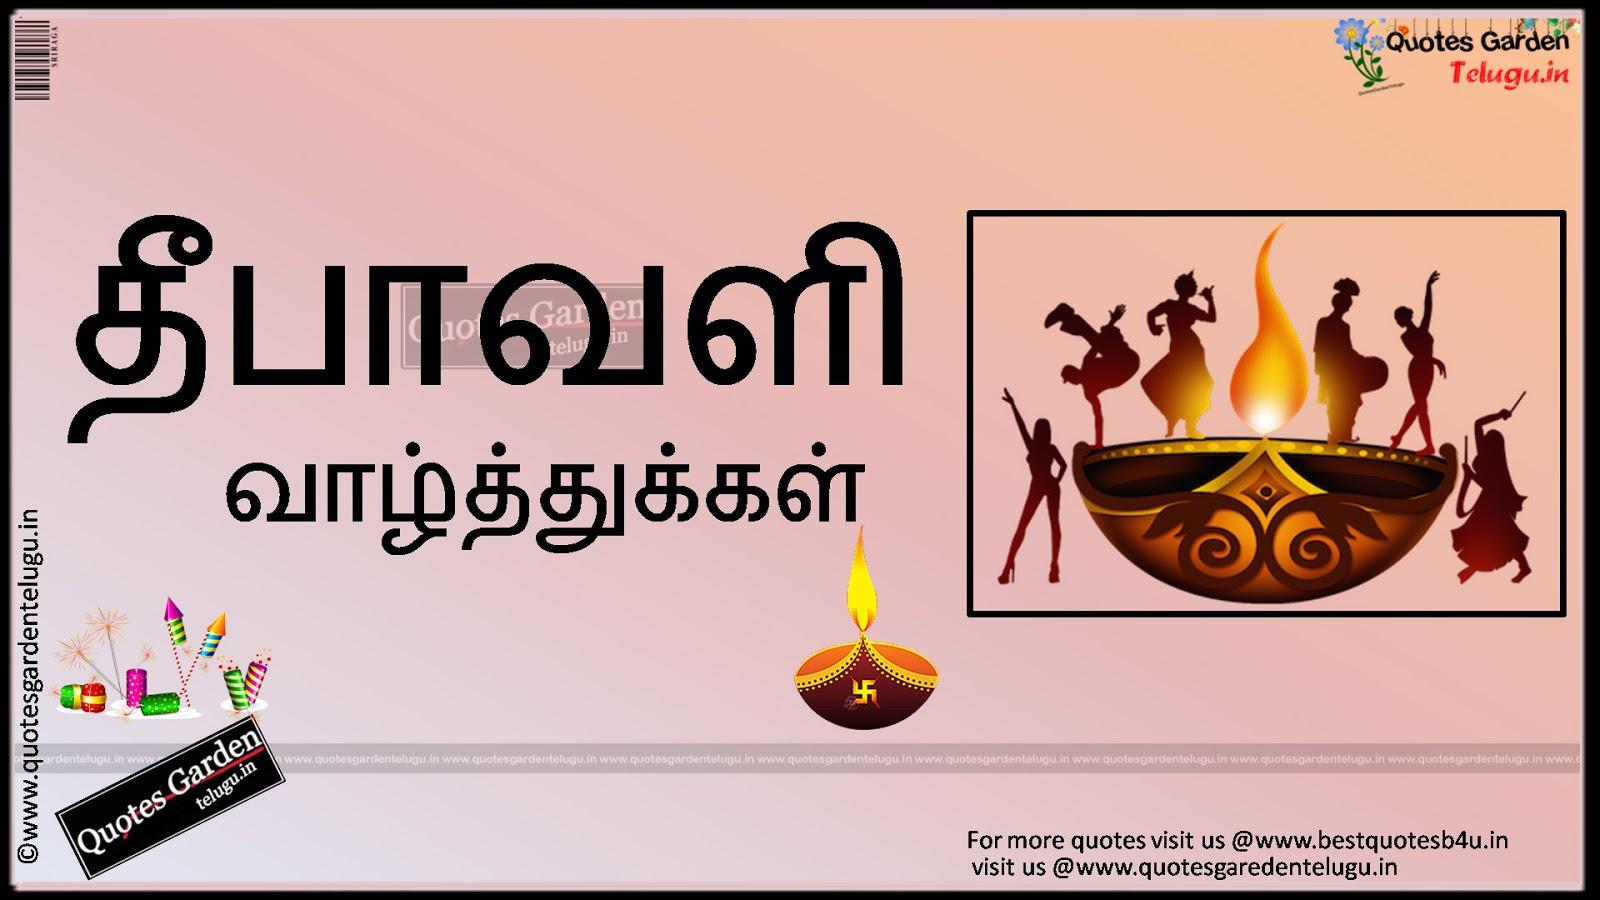 Deepavali Tamil Greetings Kavithai Valthukal Quotes Garden Telugu